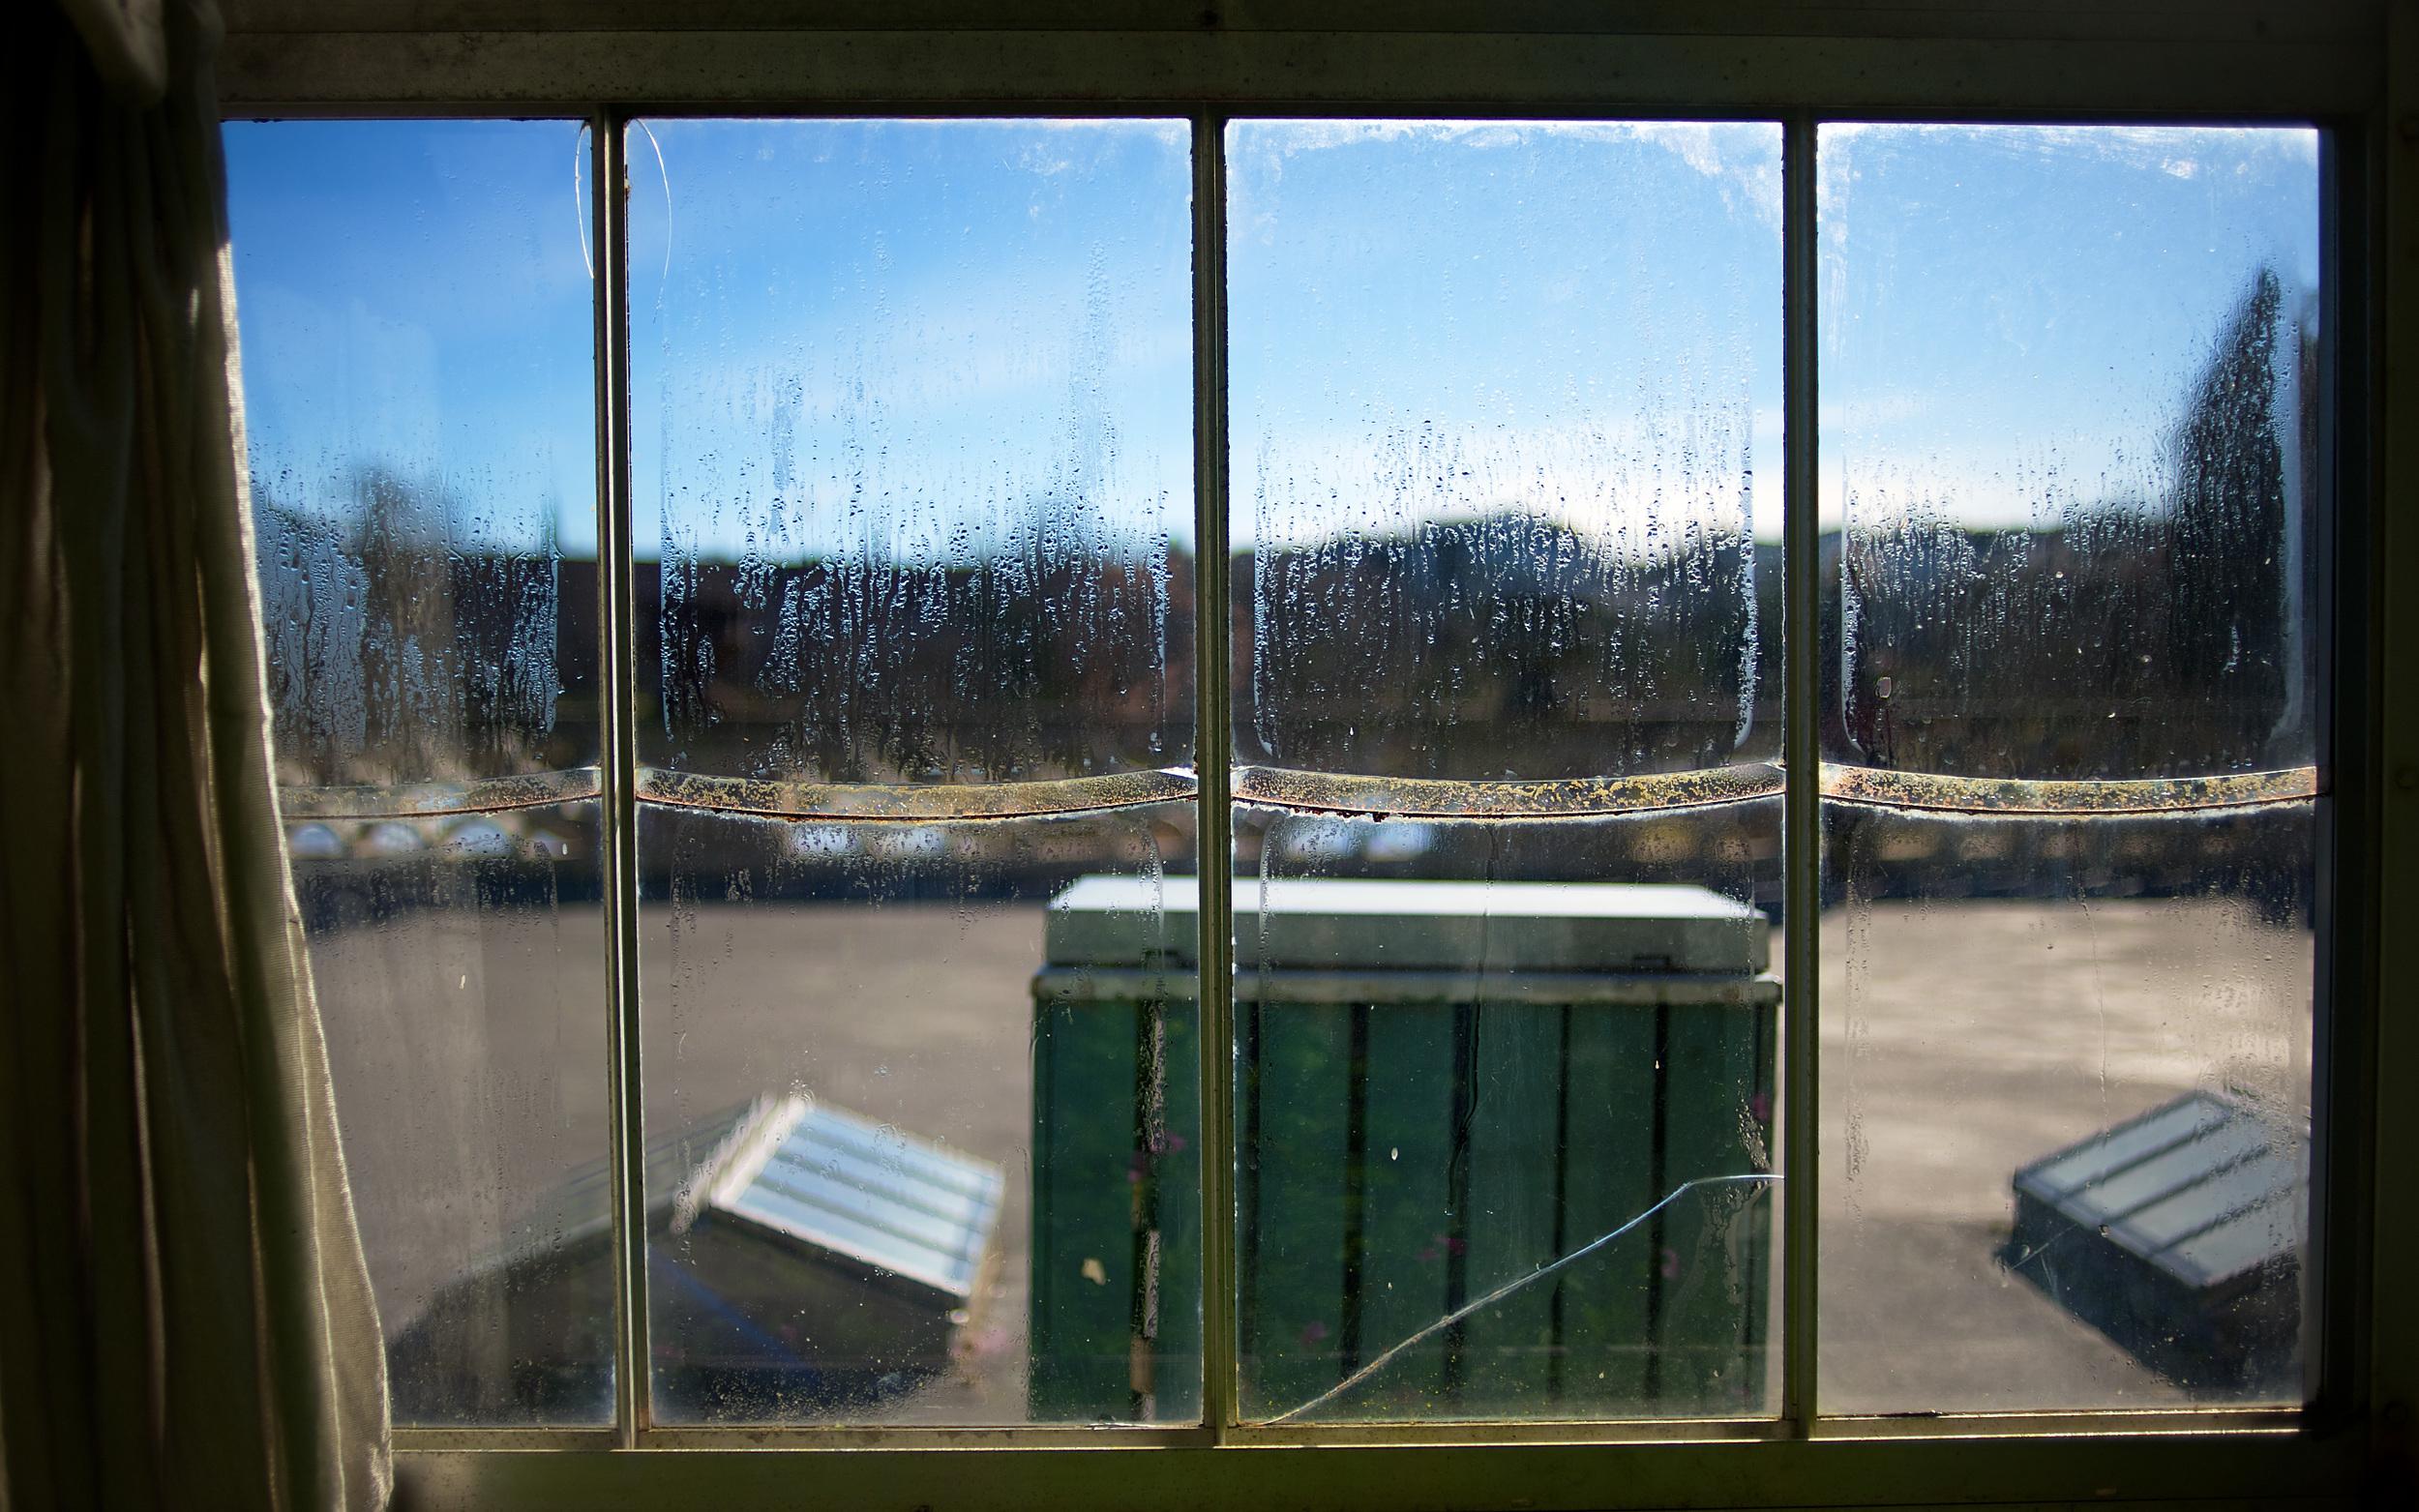 Window_2880x1800.jpg